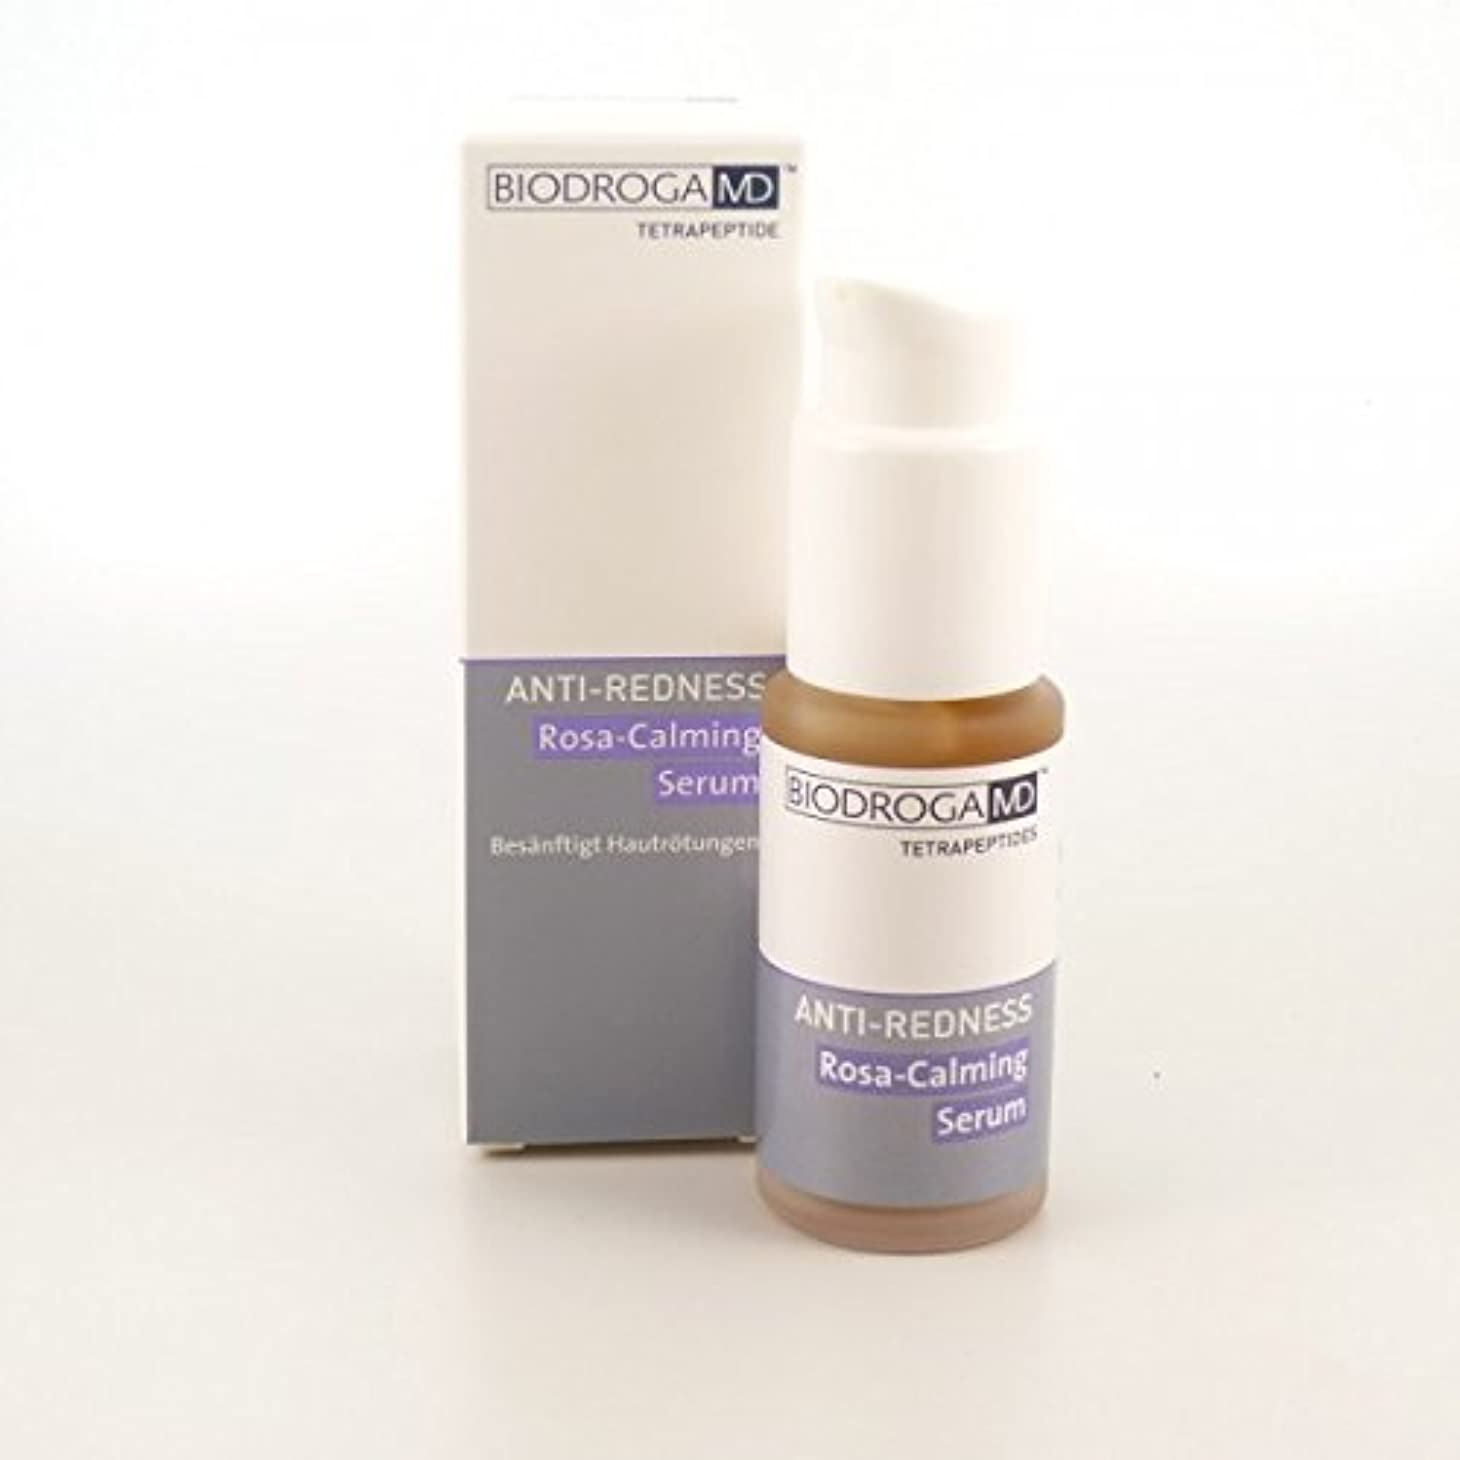 Biodroga MD:ローザカルミングセラム(30 ml)